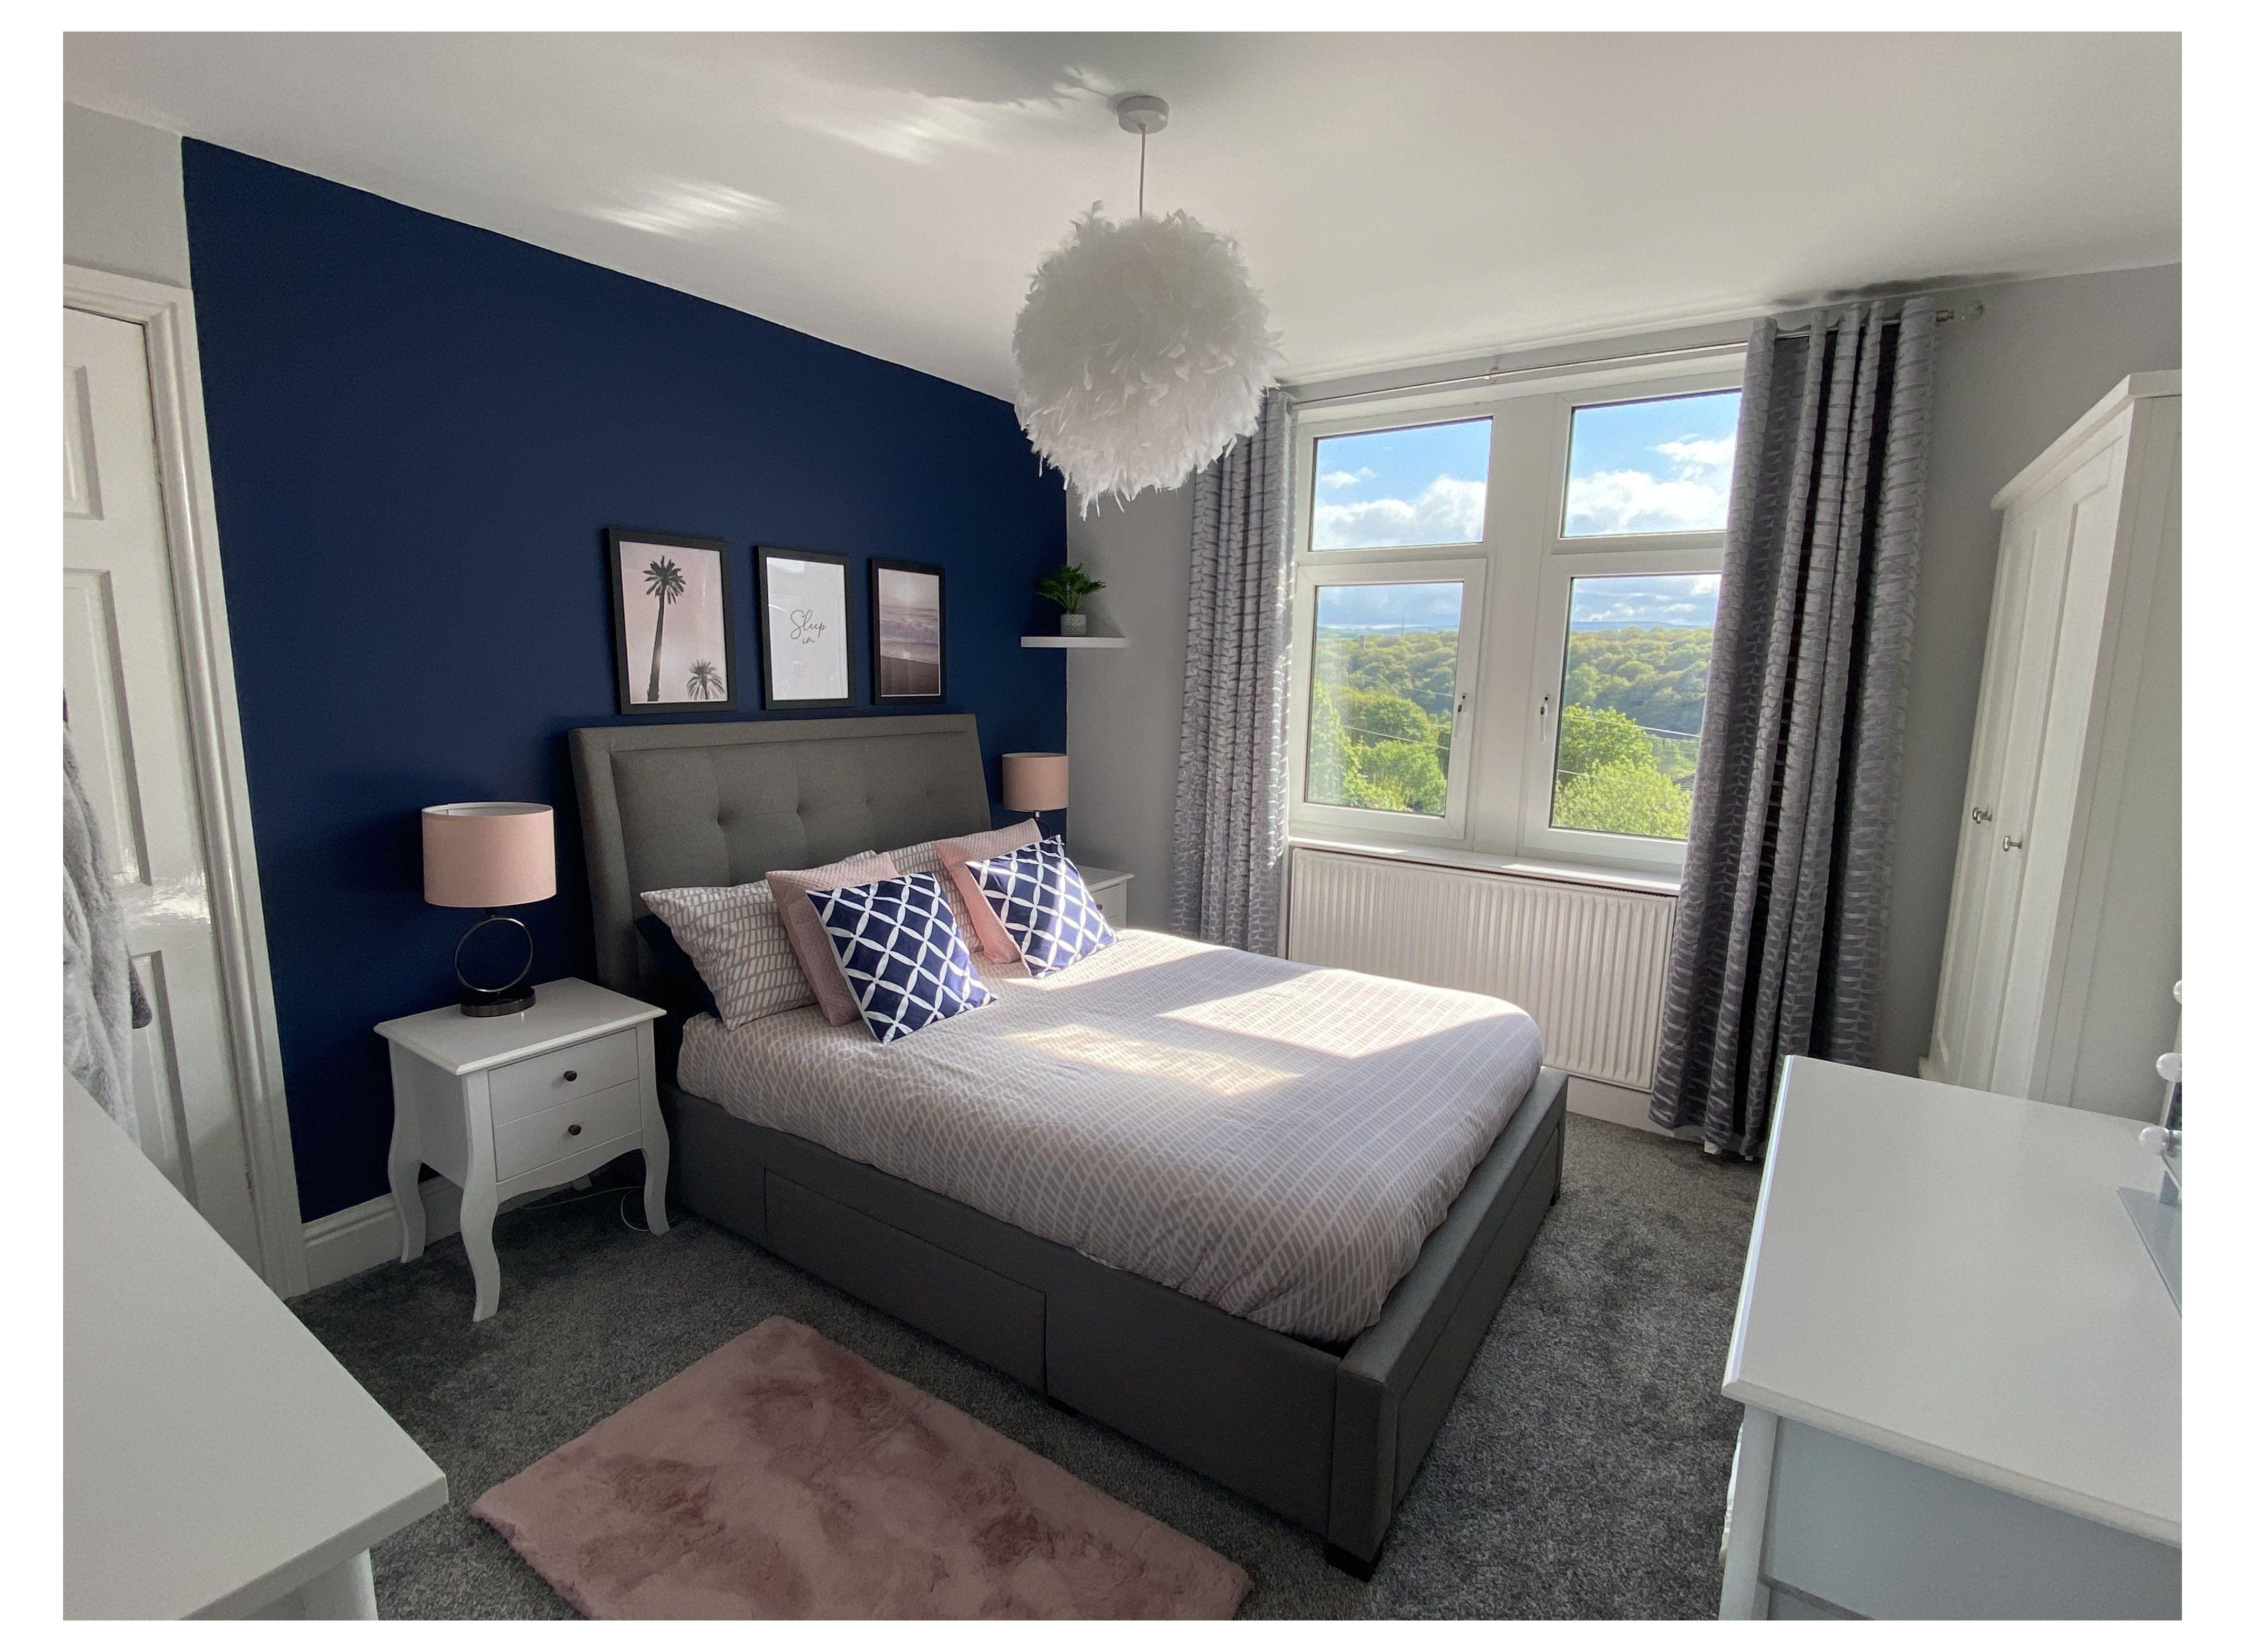 Dulux Sapphire Salute Grey And Navy Bedroom Furniture Greyandnavybedroomfurniture In 2021 Blue Bedroom Walls Blue Bedroom Decor Blue Bedroom